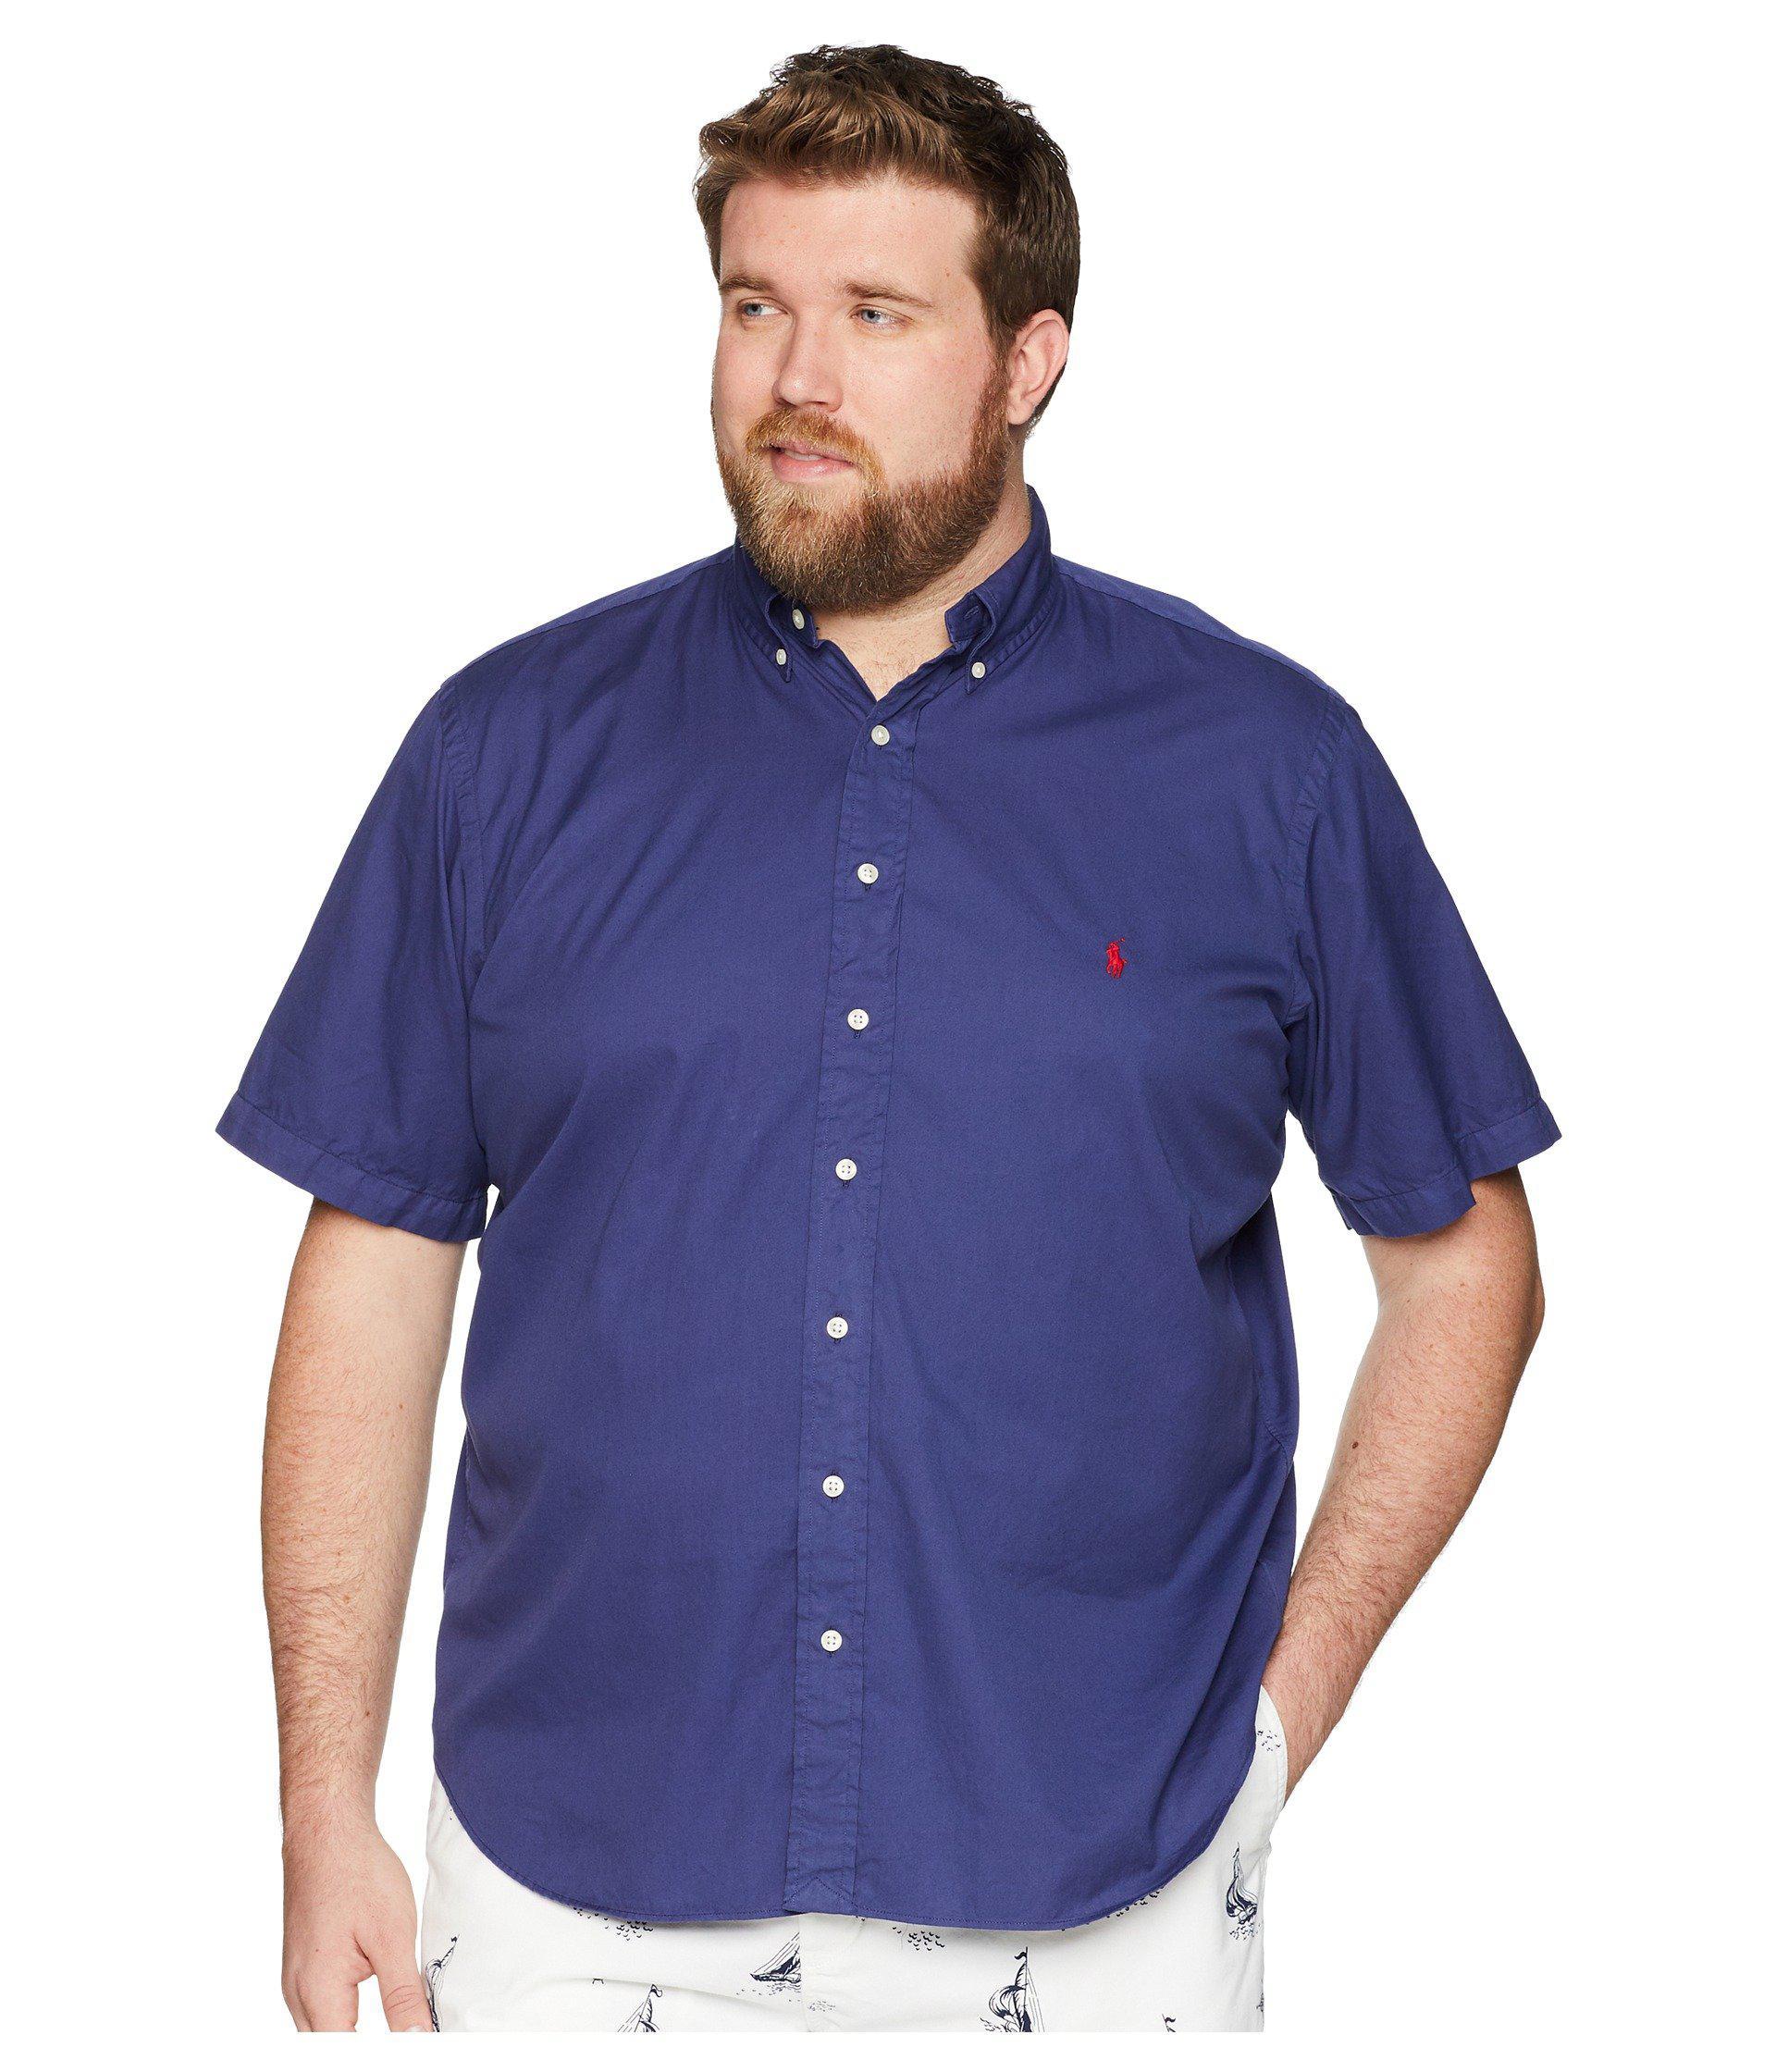 74dd0dcd71b5 Lyst - Polo Ralph Lauren Big   Tall Garment Dyed Chino Short Sleeve ...